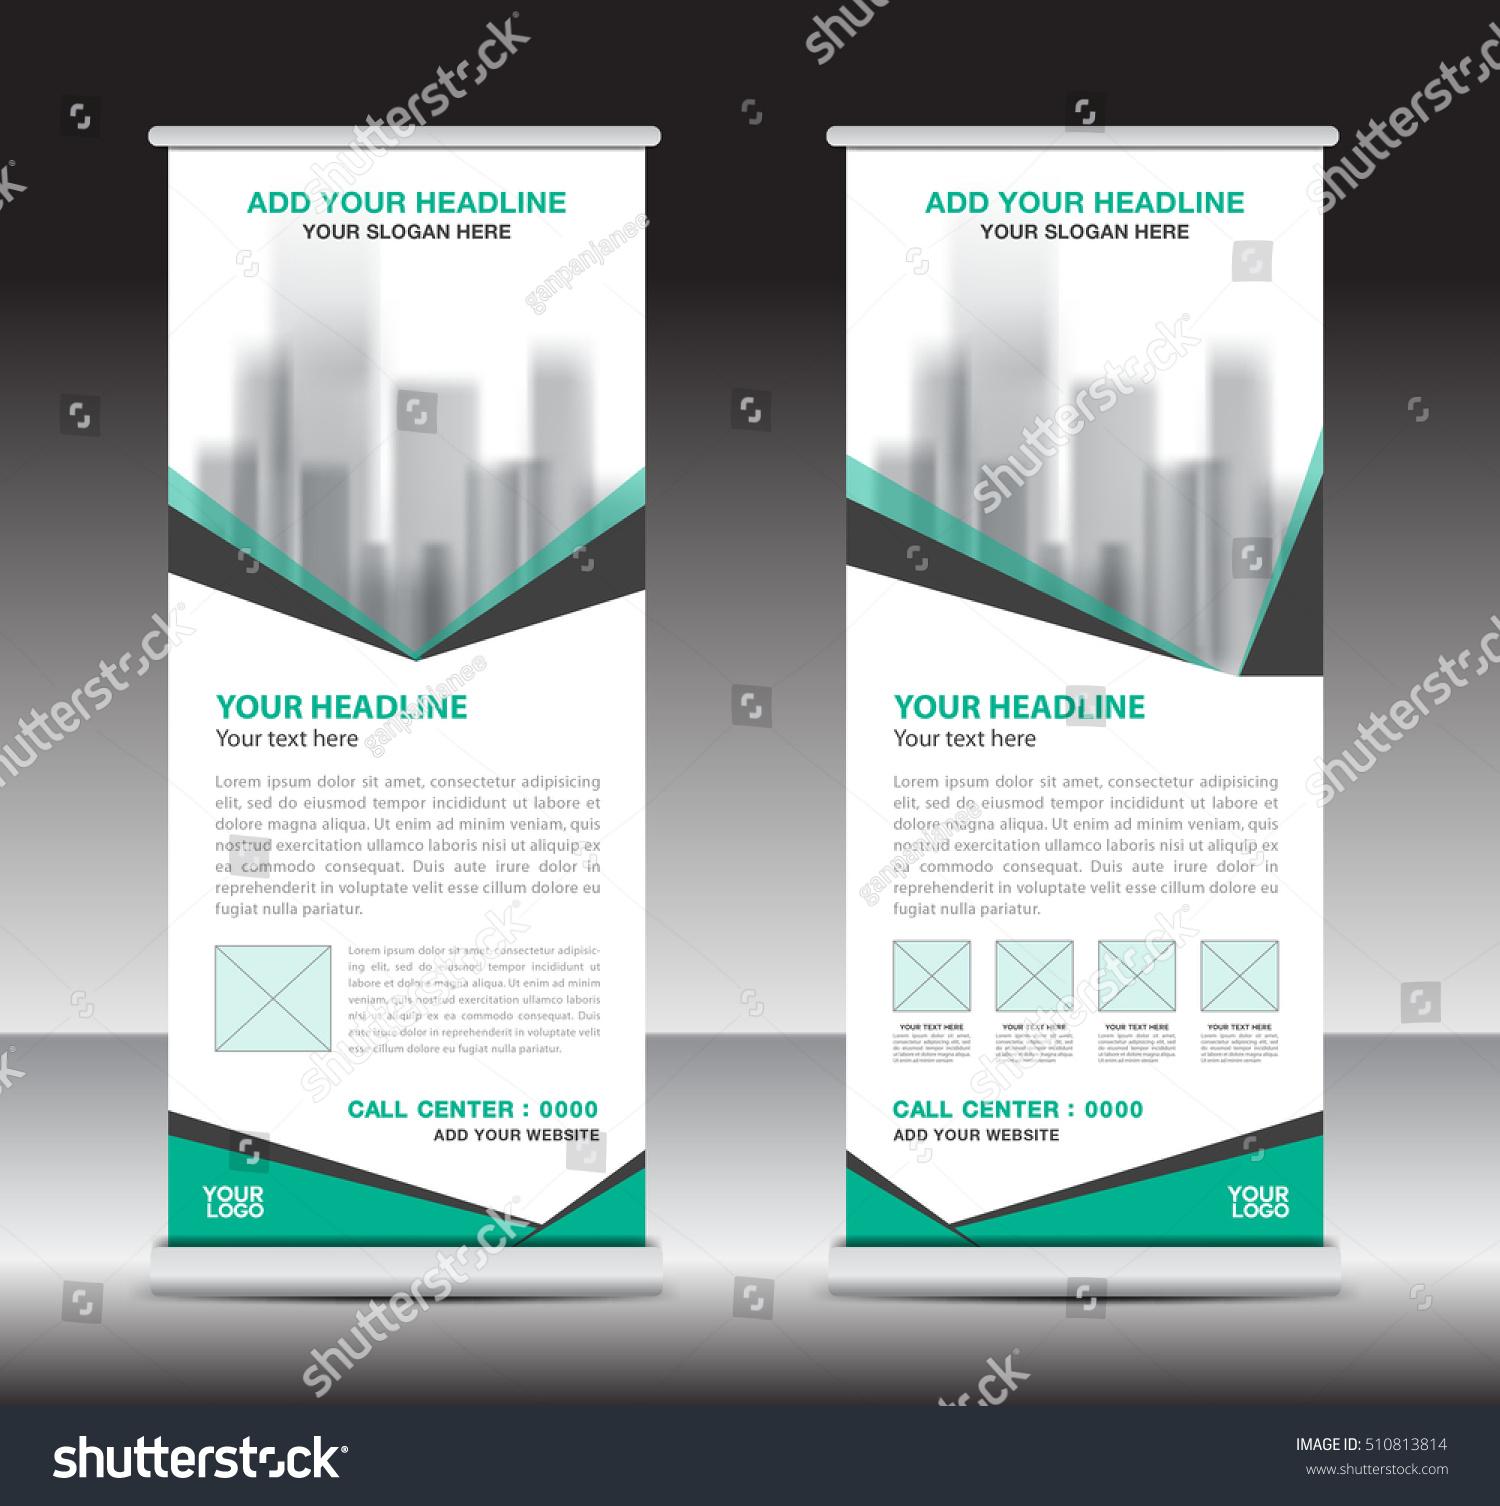 Green roll up business brochure flyer banner design vertical template - Green Roll Up Business Brochure Flyer Banner Design Vertical Template Vector X Stand